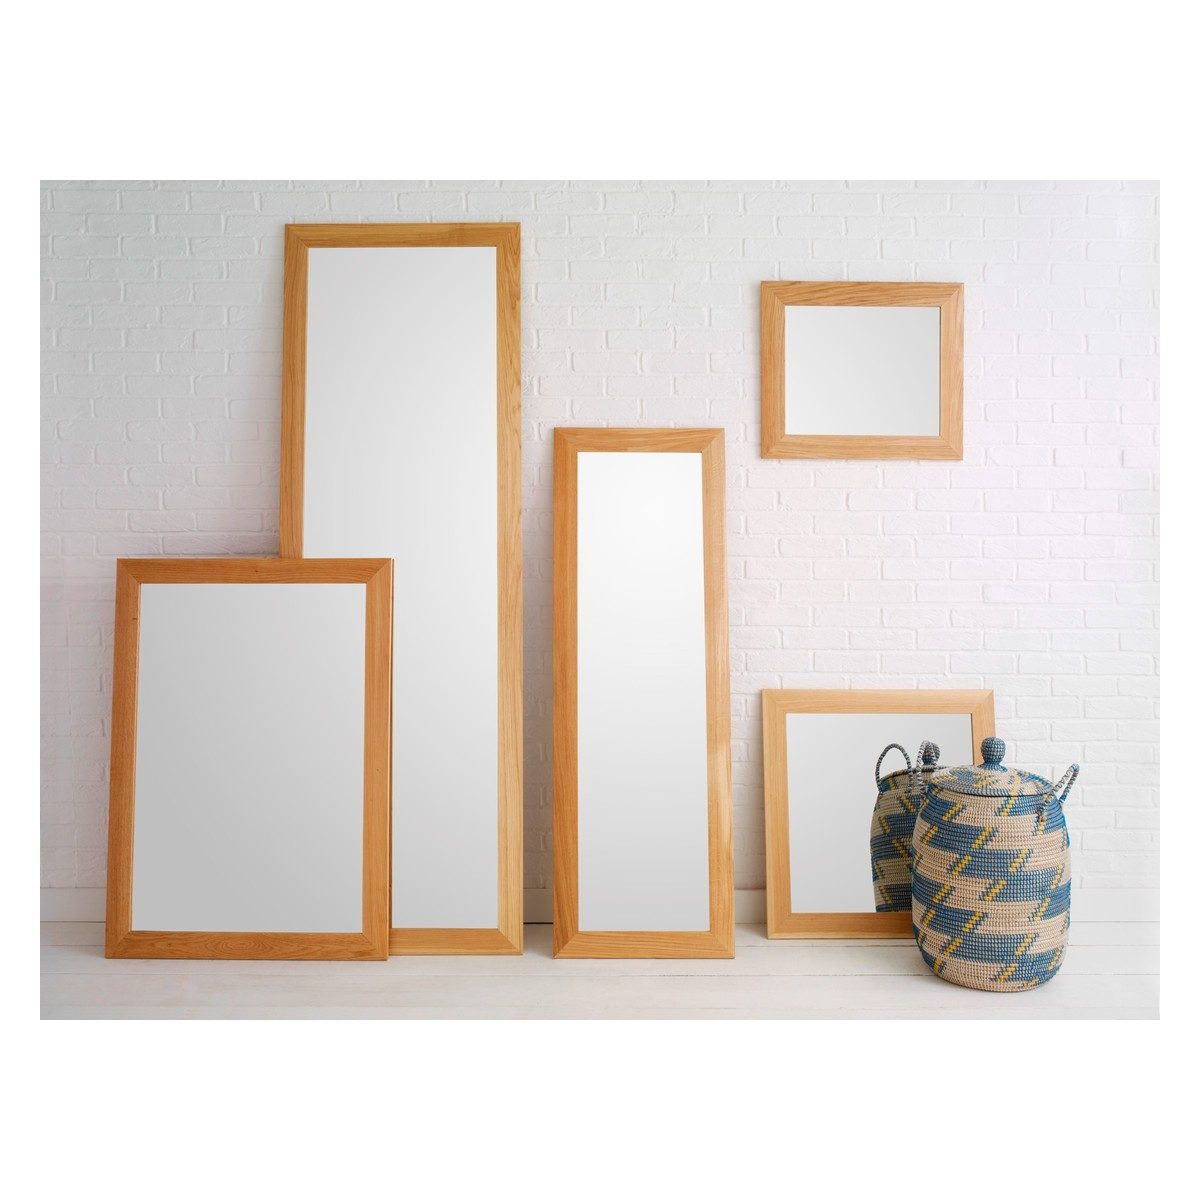 Marlo 70 X 100cm Rectangular Oak Wall Mirror Buy Now At Habitat Uk Pertaining To Oak Mirror (View 12 of 15)